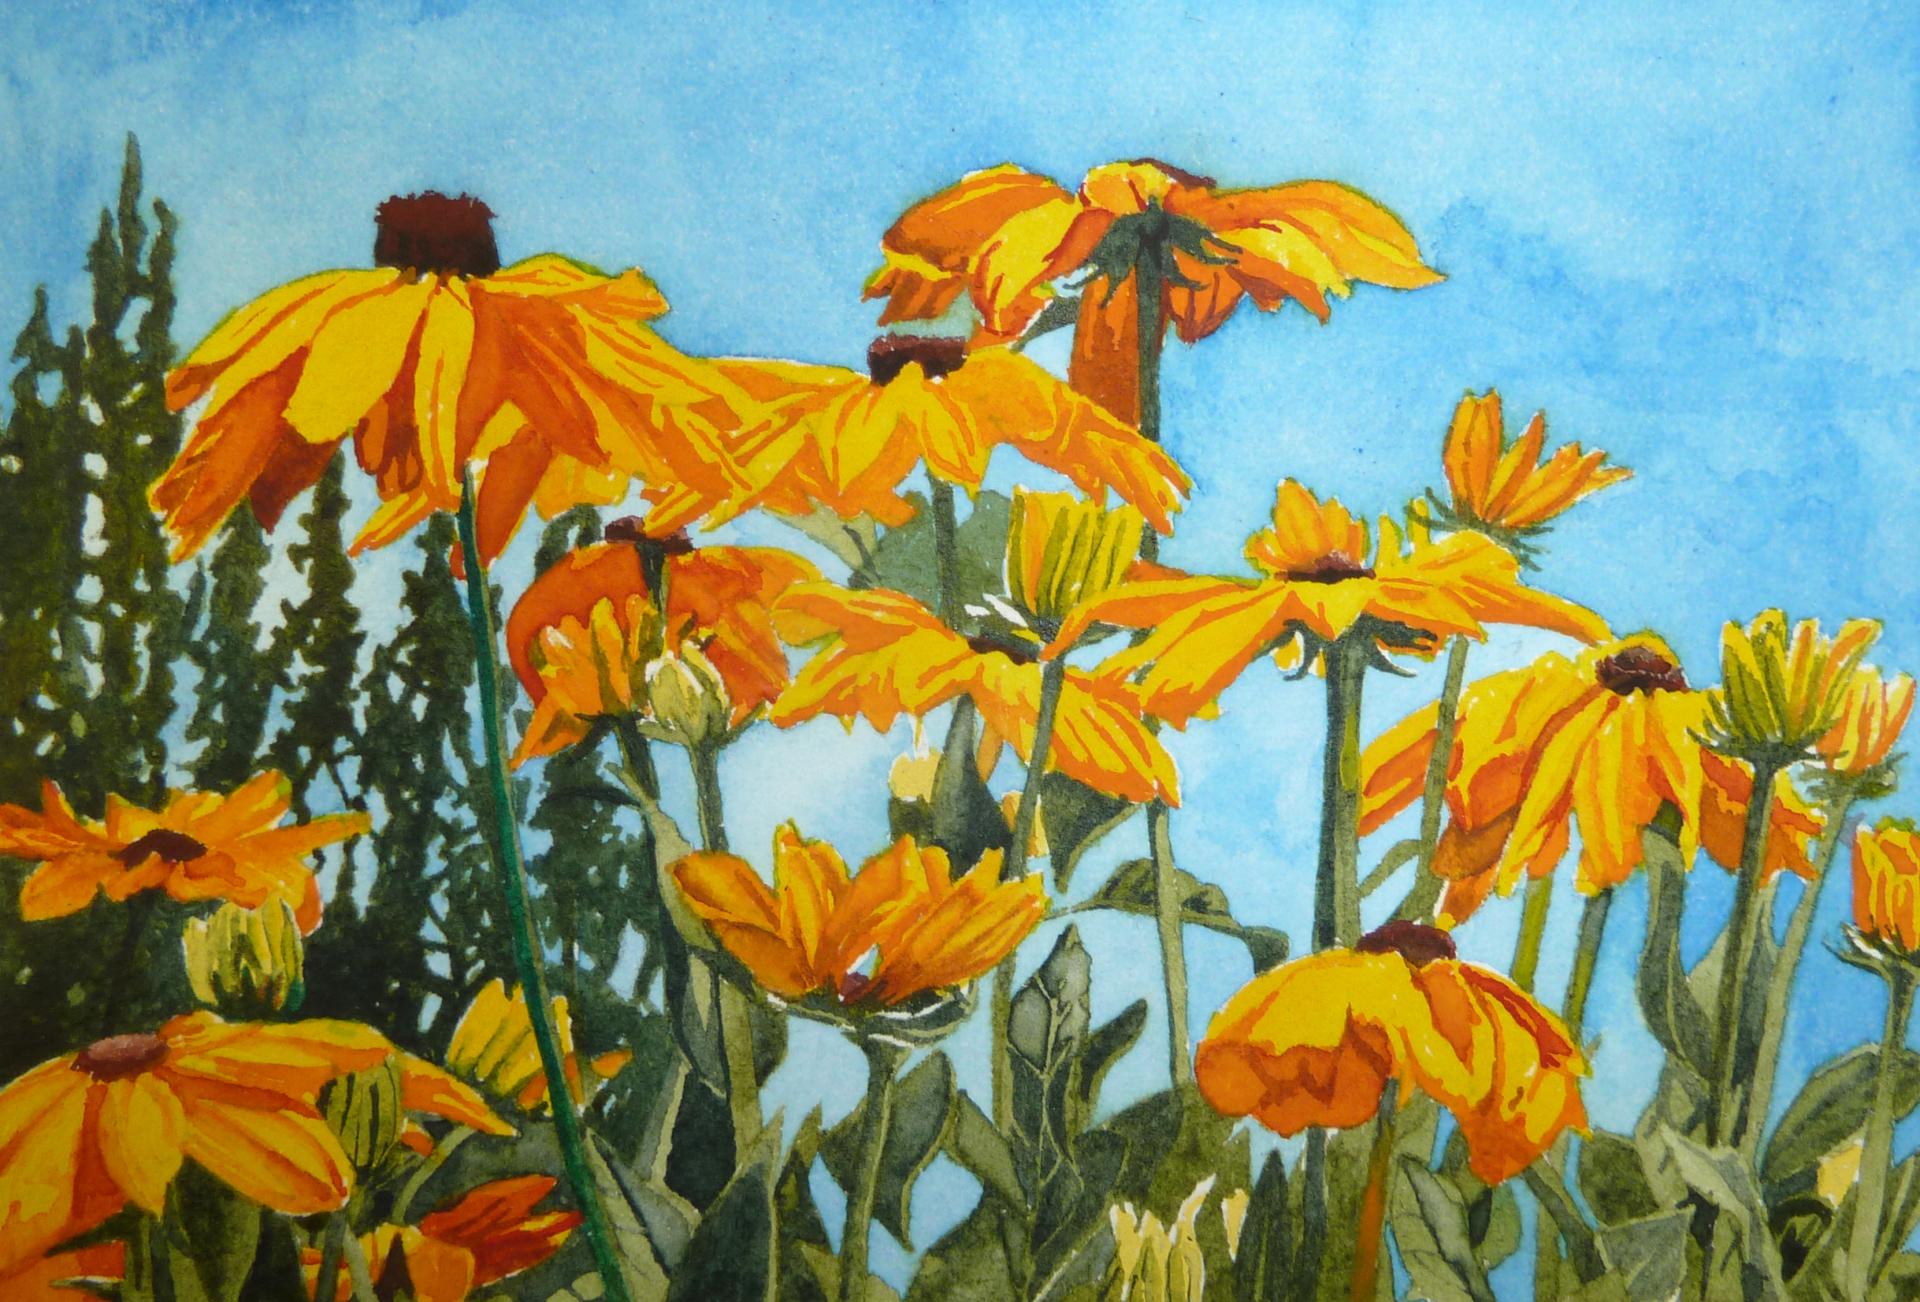 Pt Reyes Sunflowers